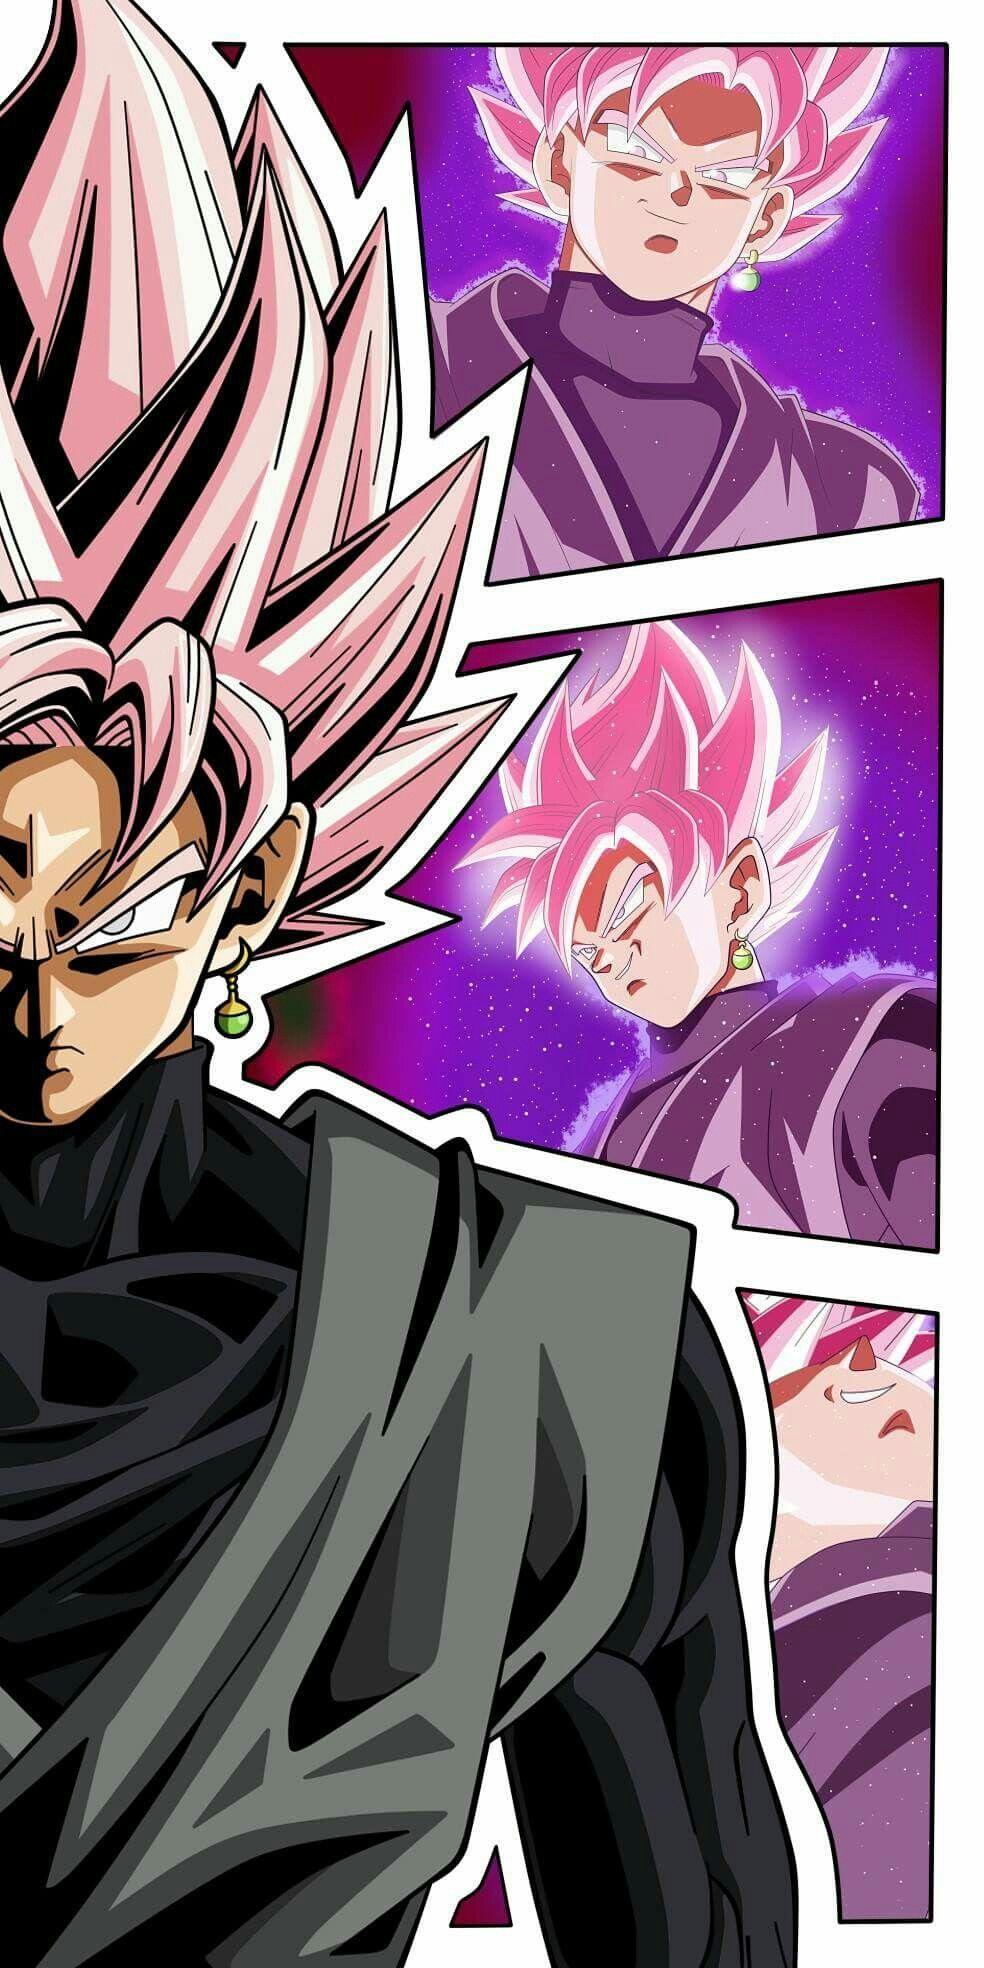 Black Goku Wallpapers Top Free Black Goku Backgrounds